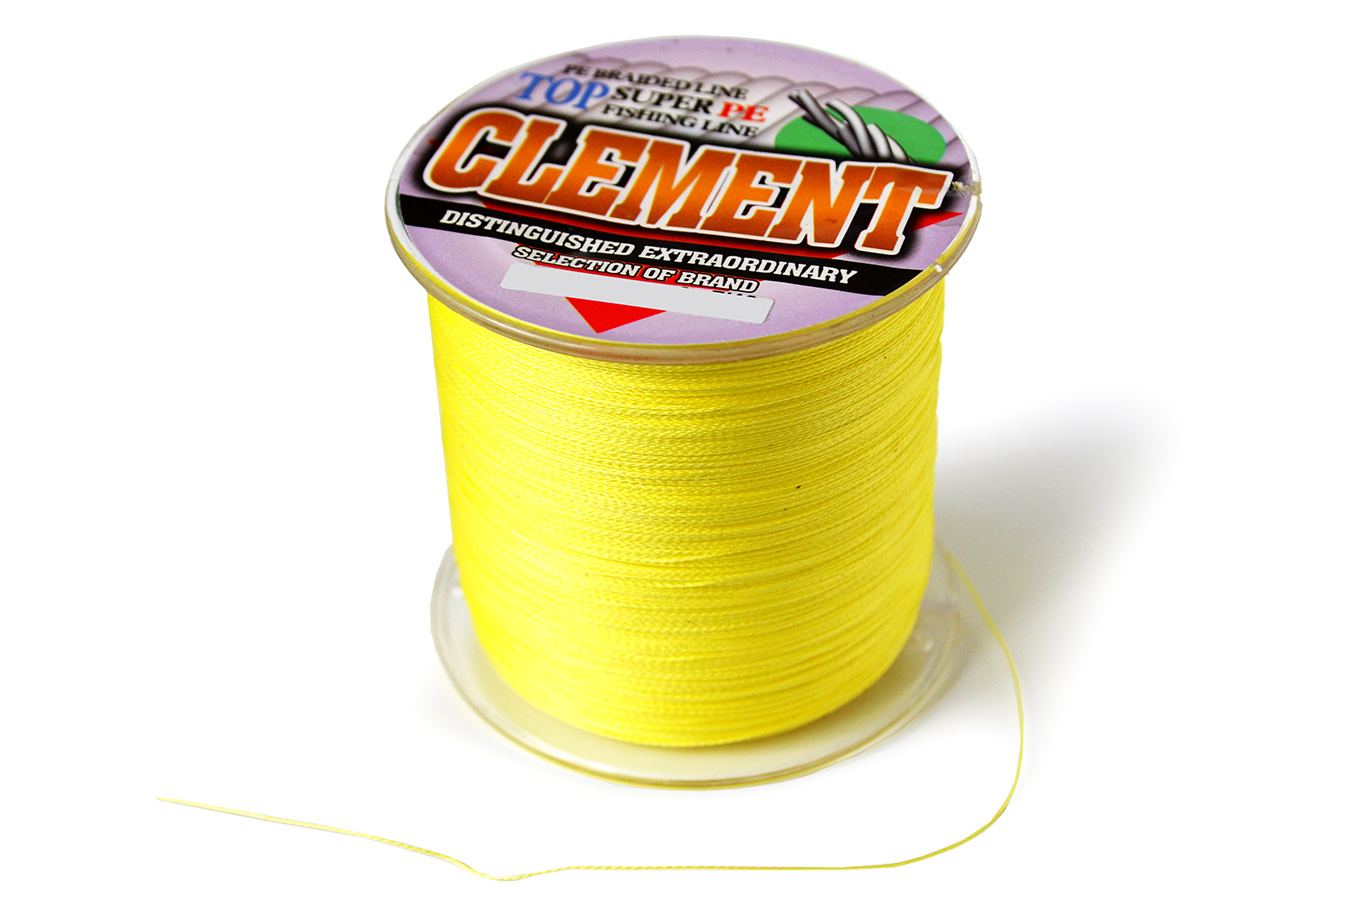 Плетеный шнур Clement Super PE 1.2# 9.07 кг, 500 м [SPE90500]